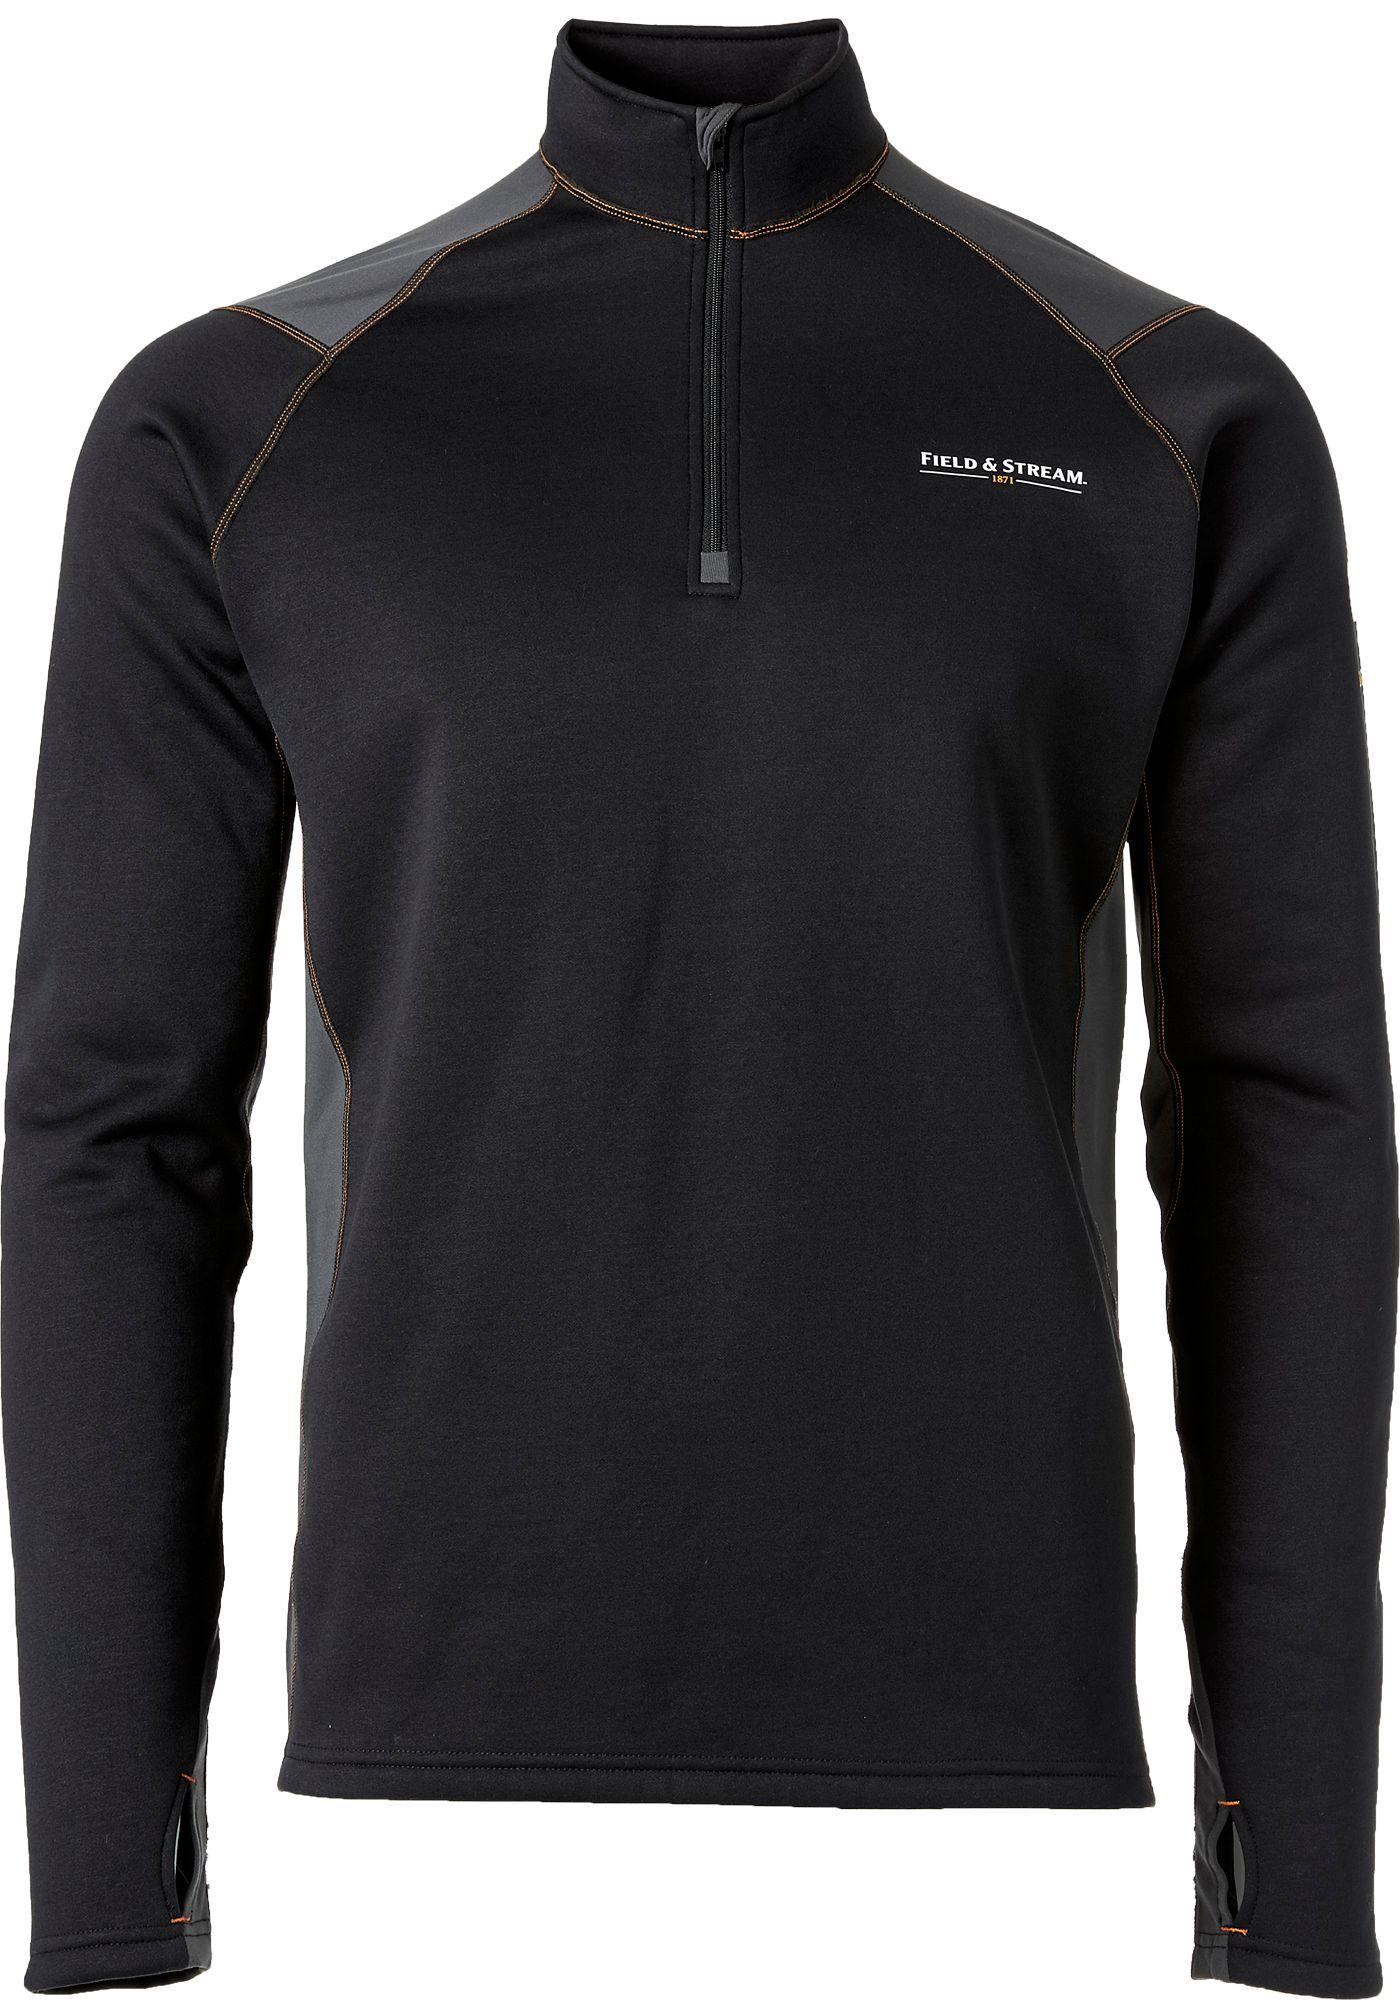 Field & Stream Men's Base Defense Arctic Chill Half Zip Base Layer Shirt